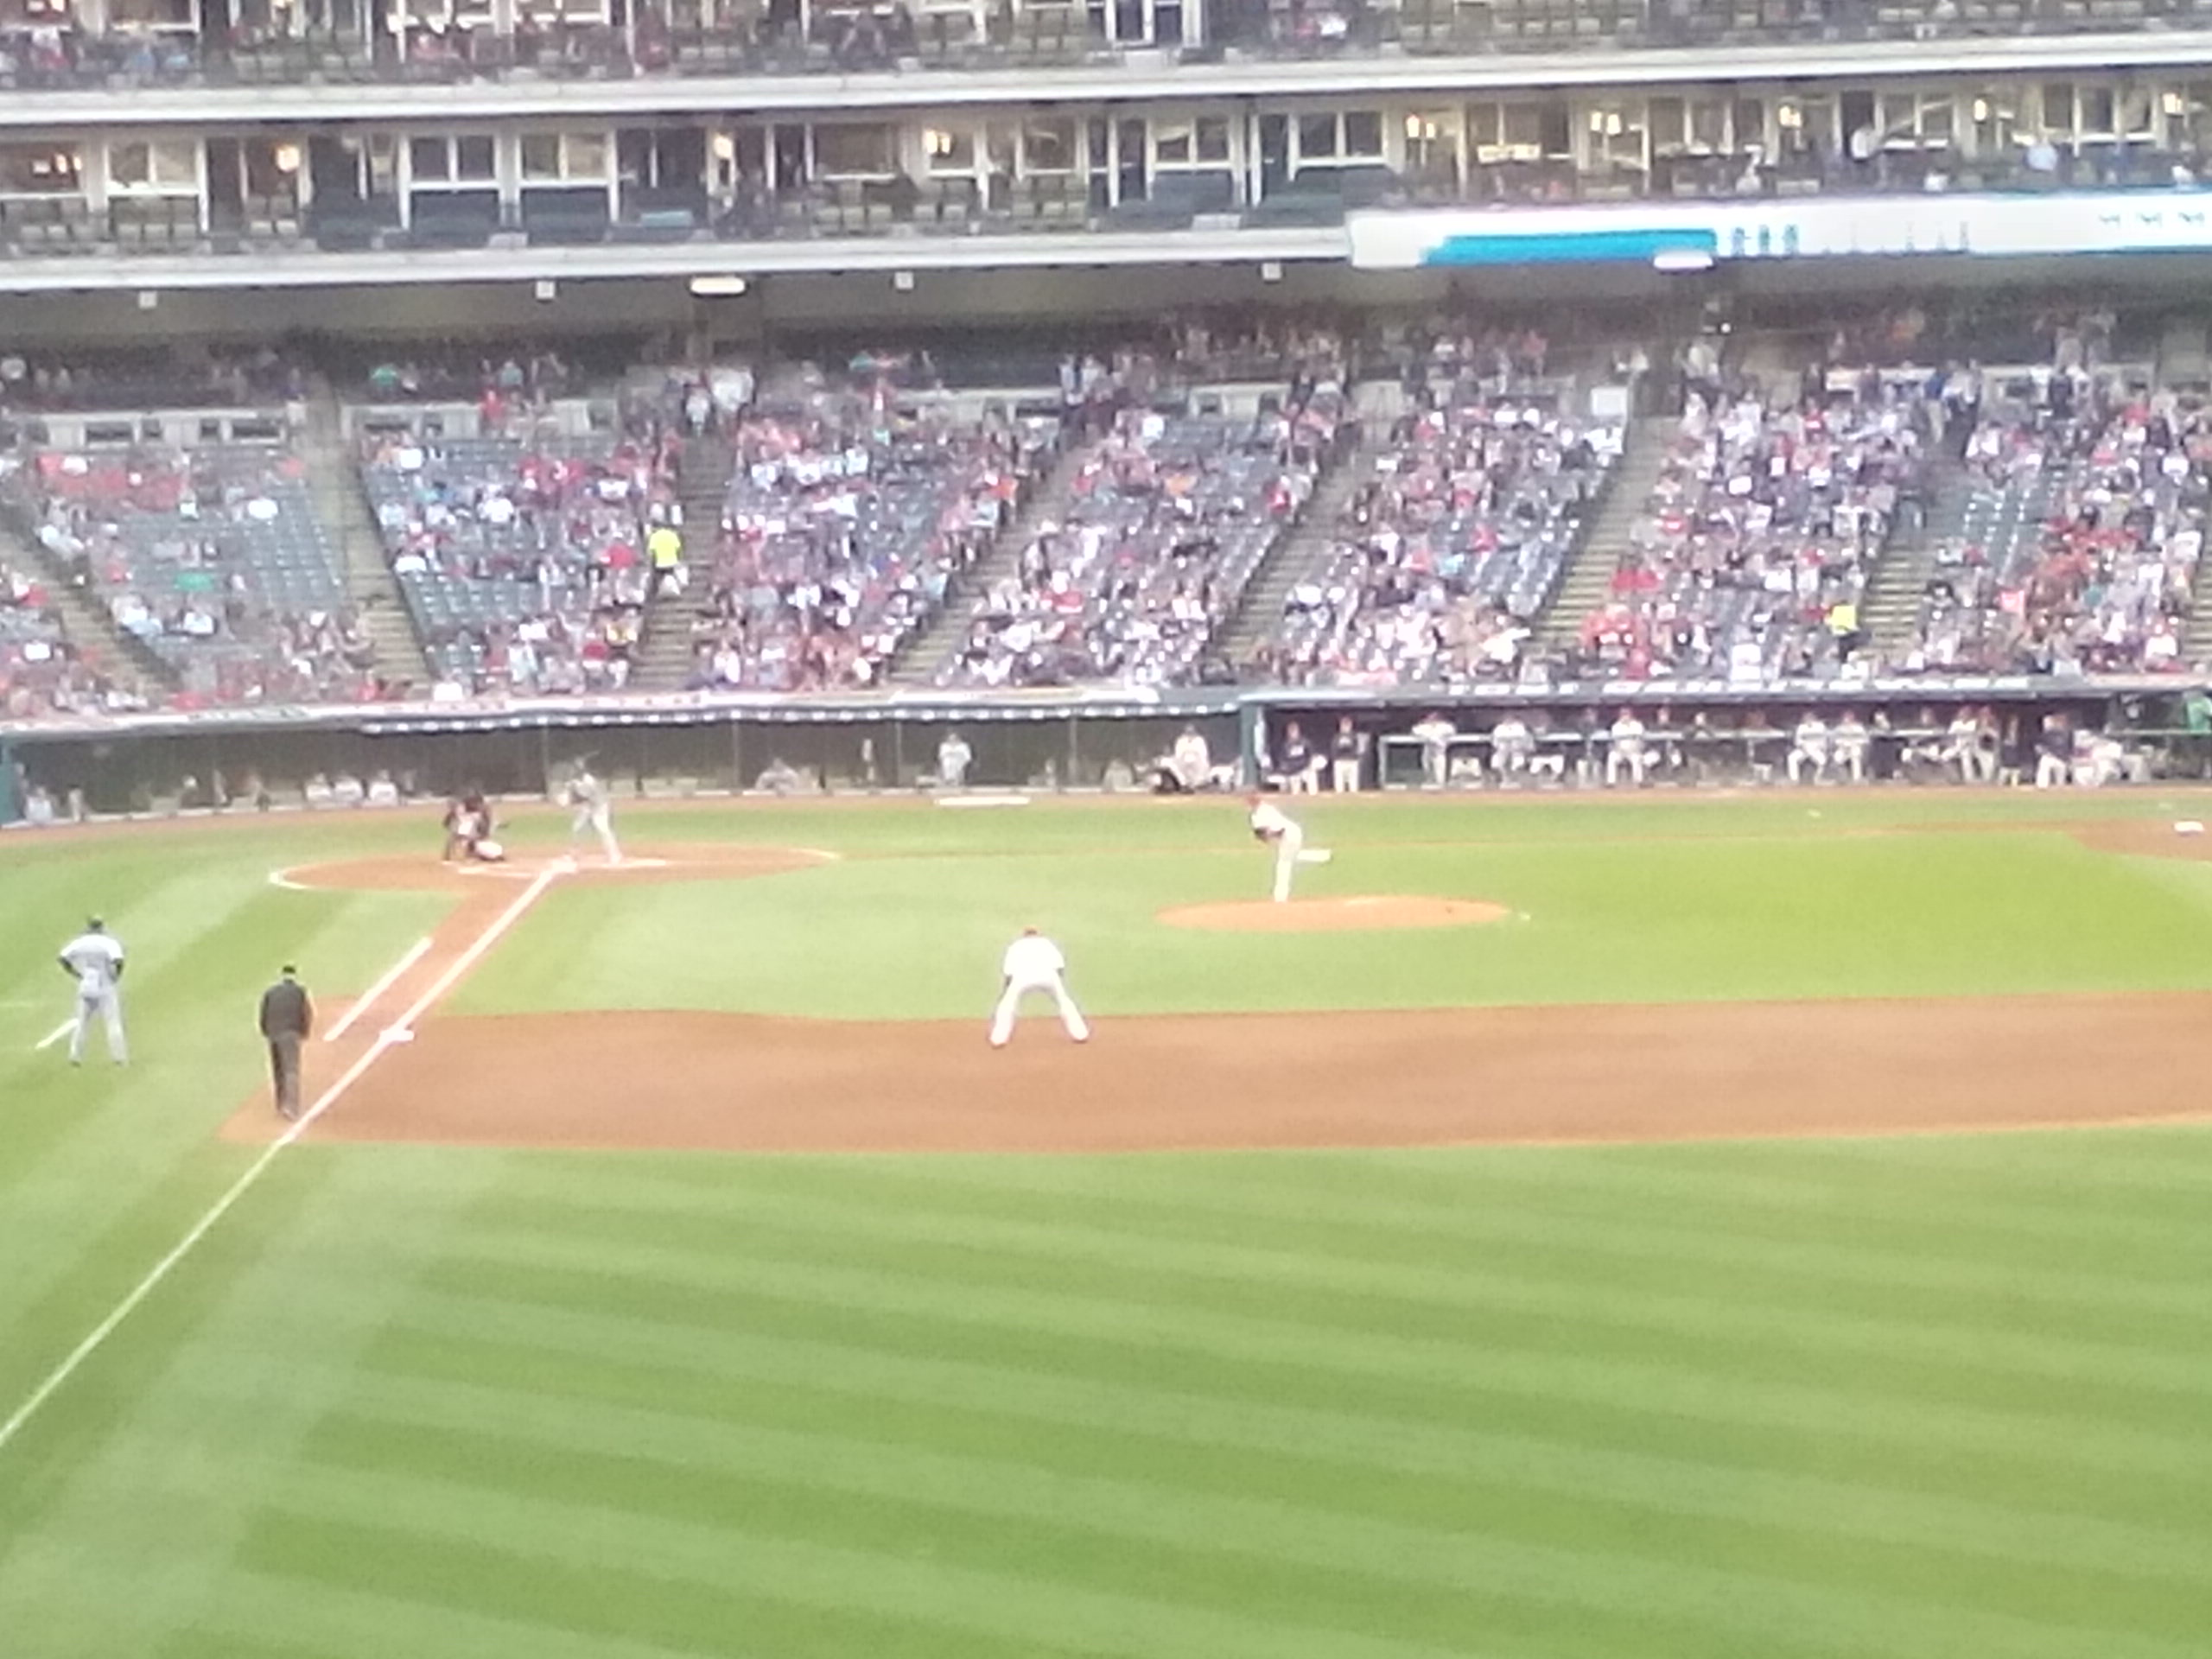 White Sox vs Indians